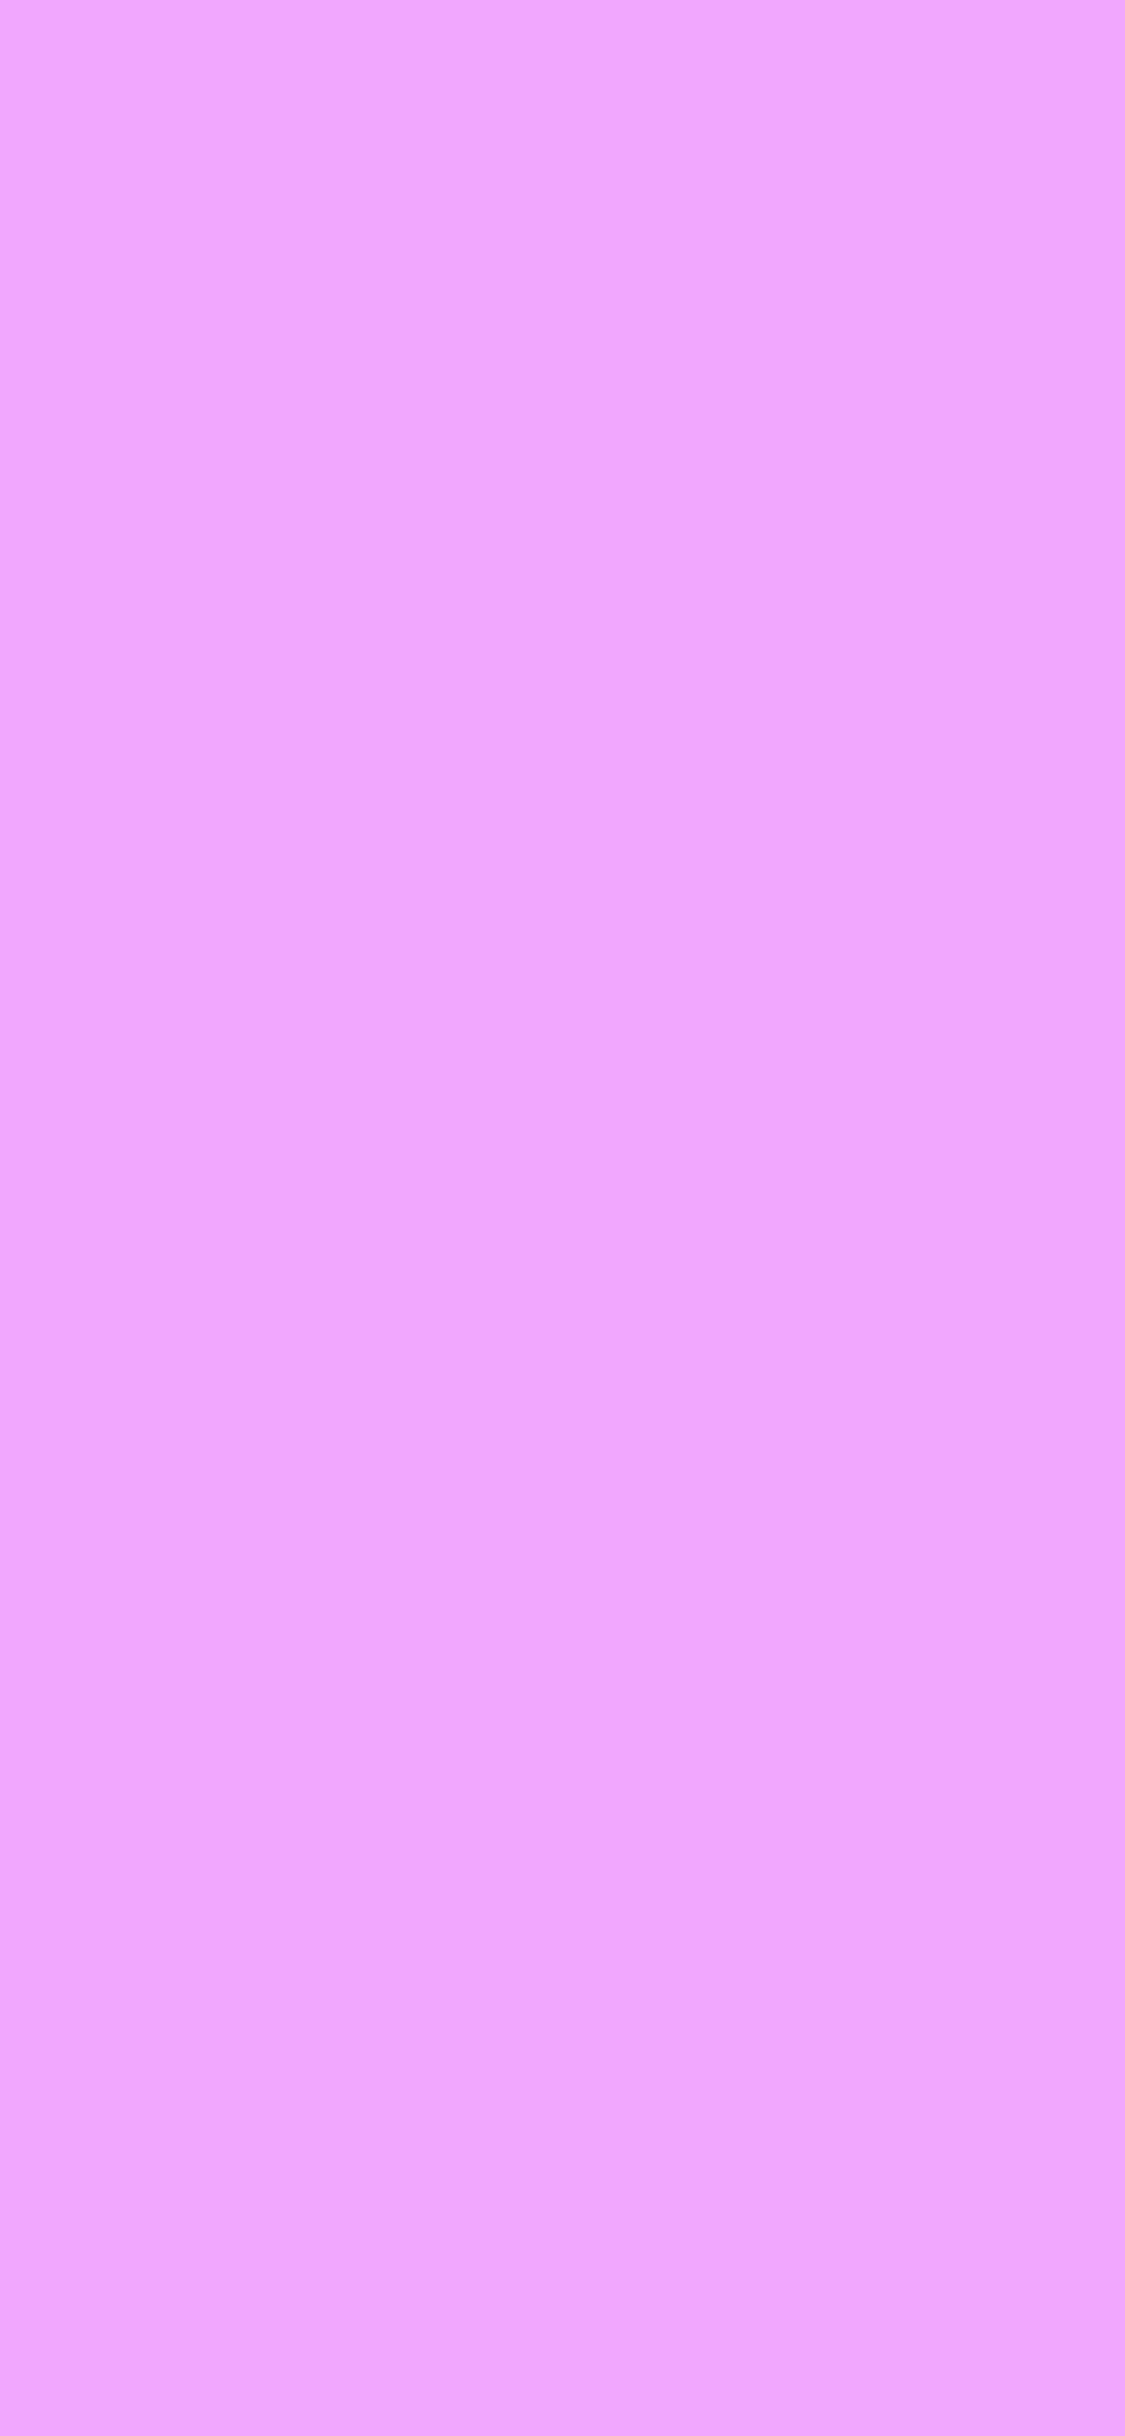 1125x2436 Rich Brilliant Lavender Solid Color Background